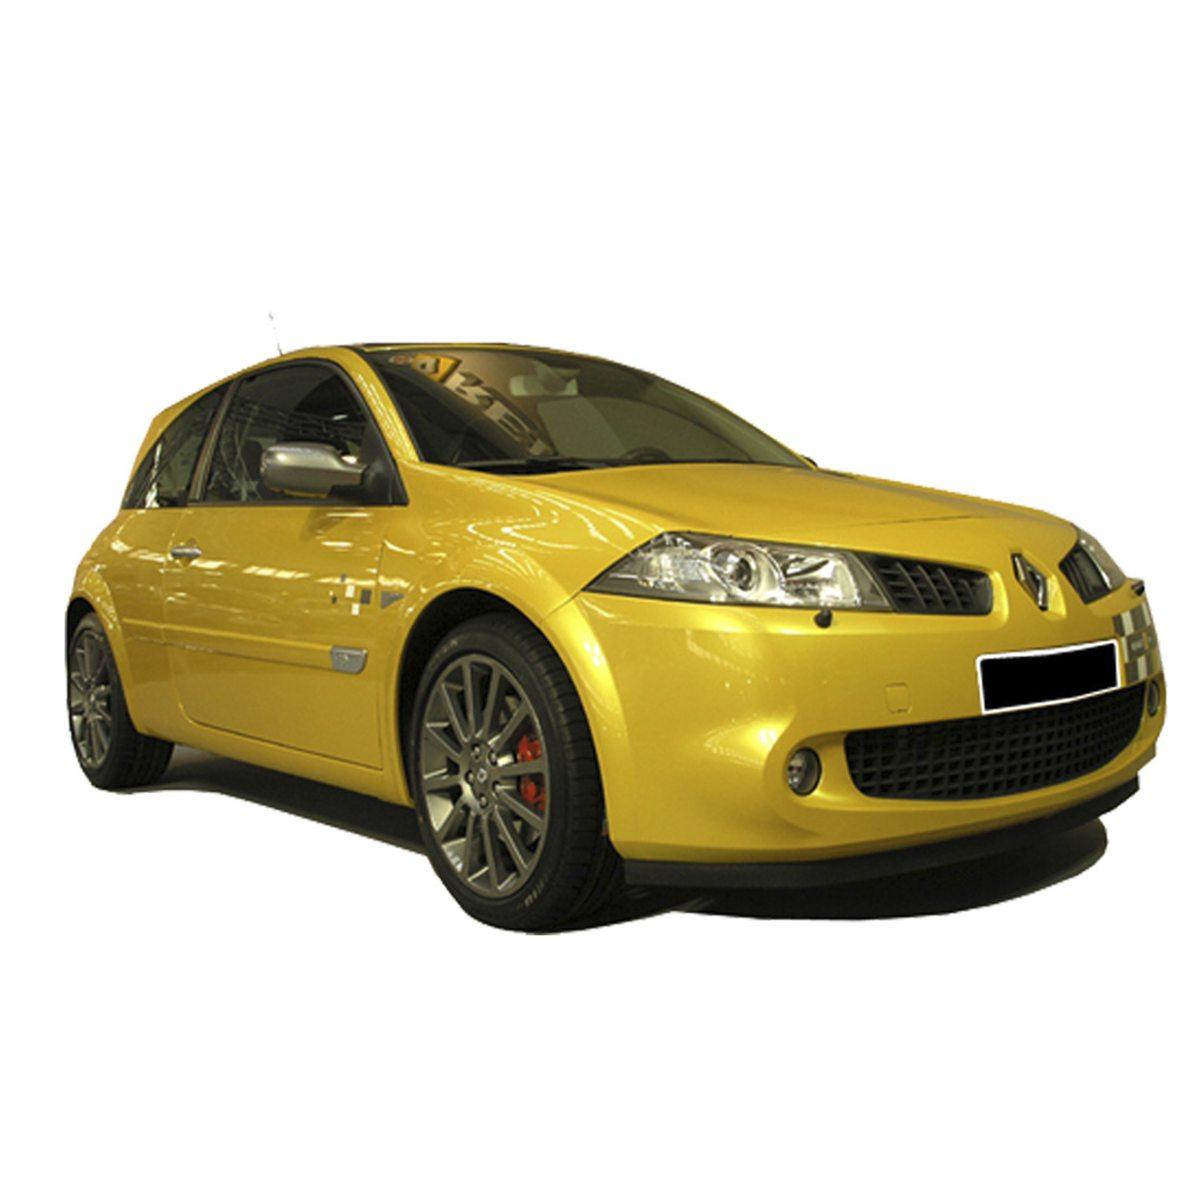 Renault-Megane-07-F1-Frt-PCU1178